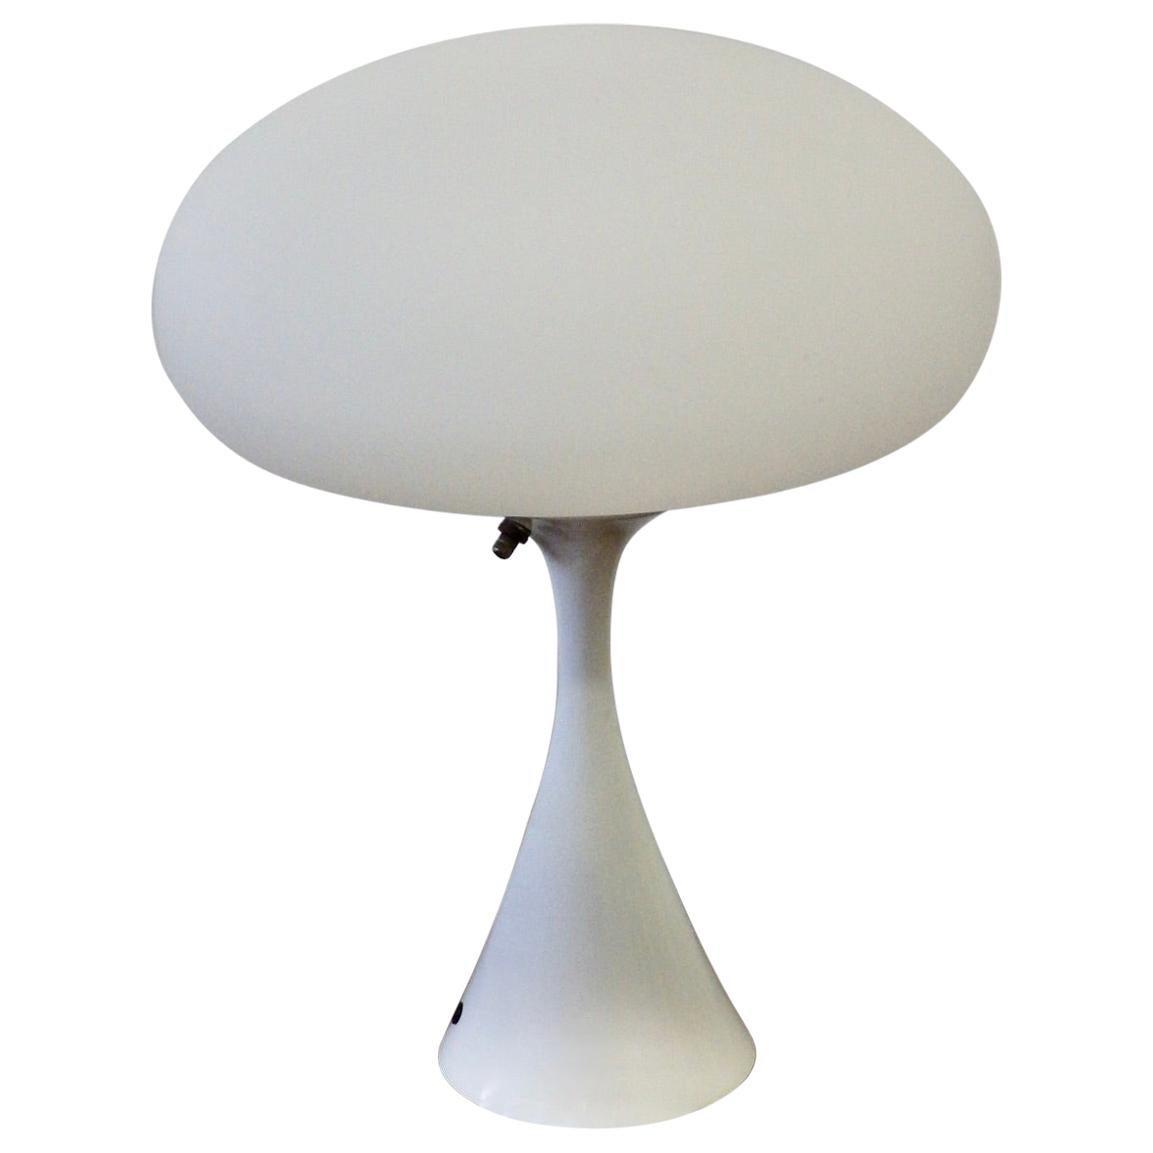 Laurel Lamp with White Mushroom Globe